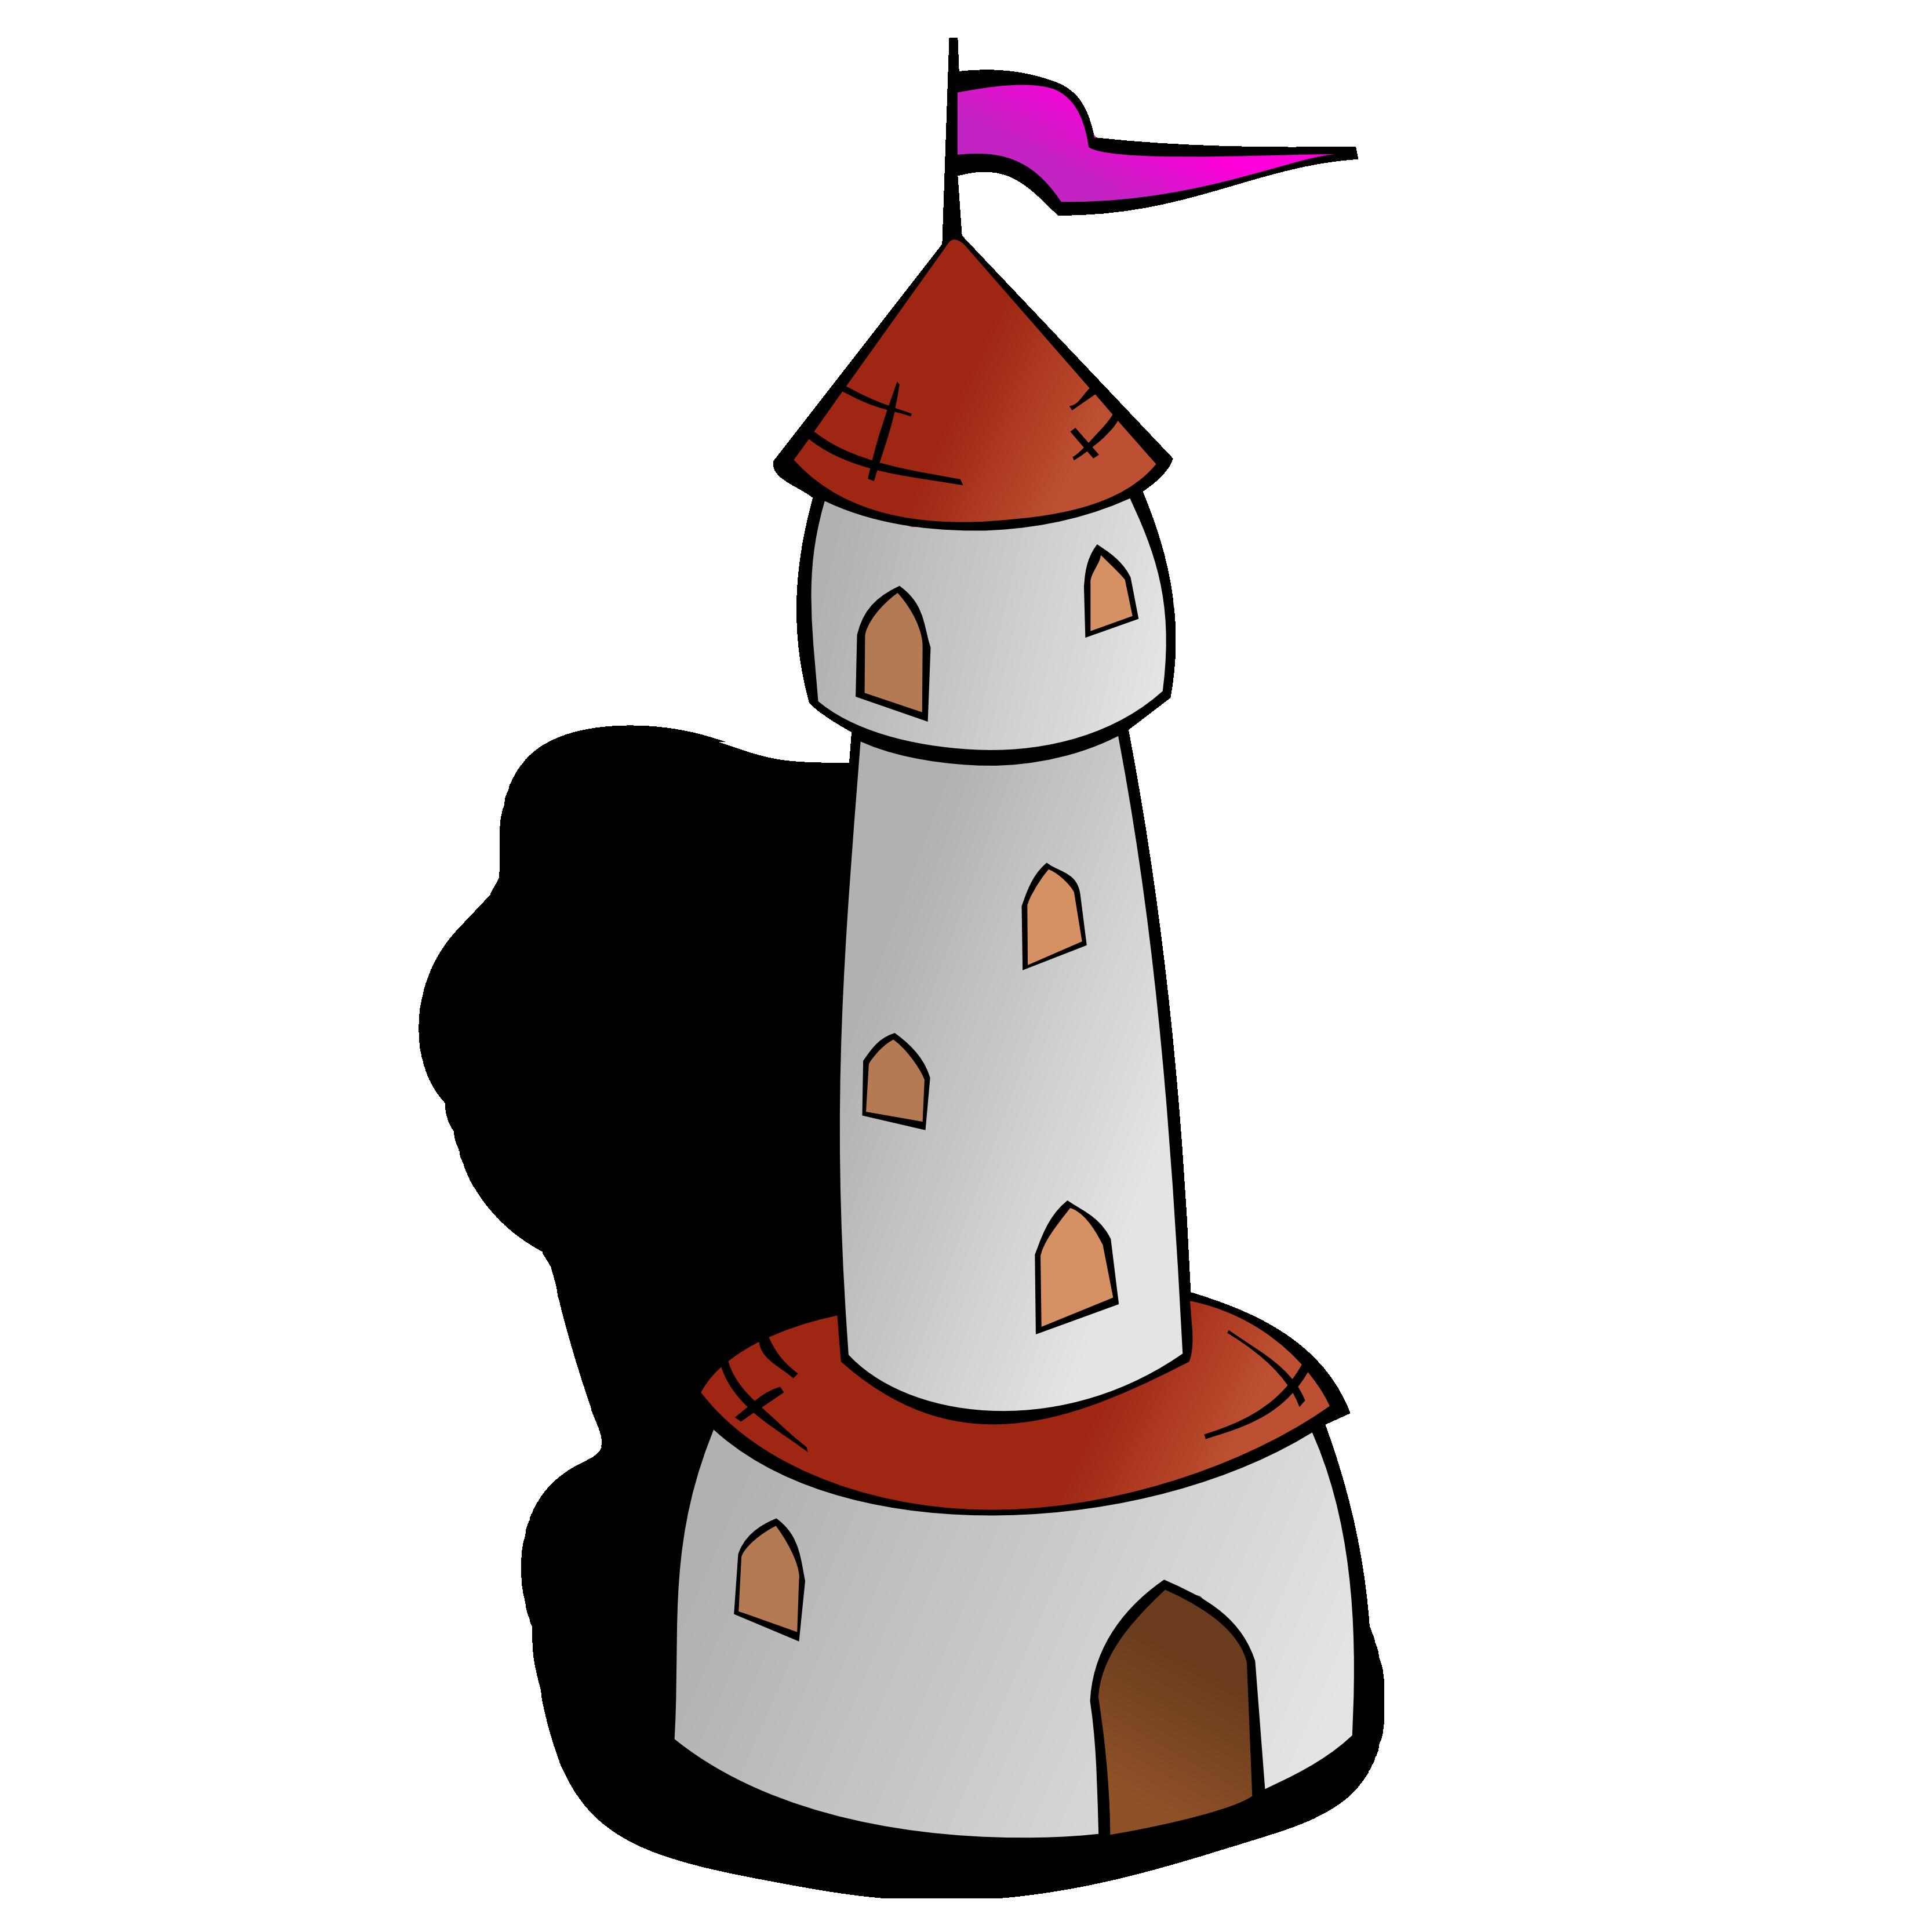 Tower clipart Clipart Clipart Tower Clipart tower%20clipart